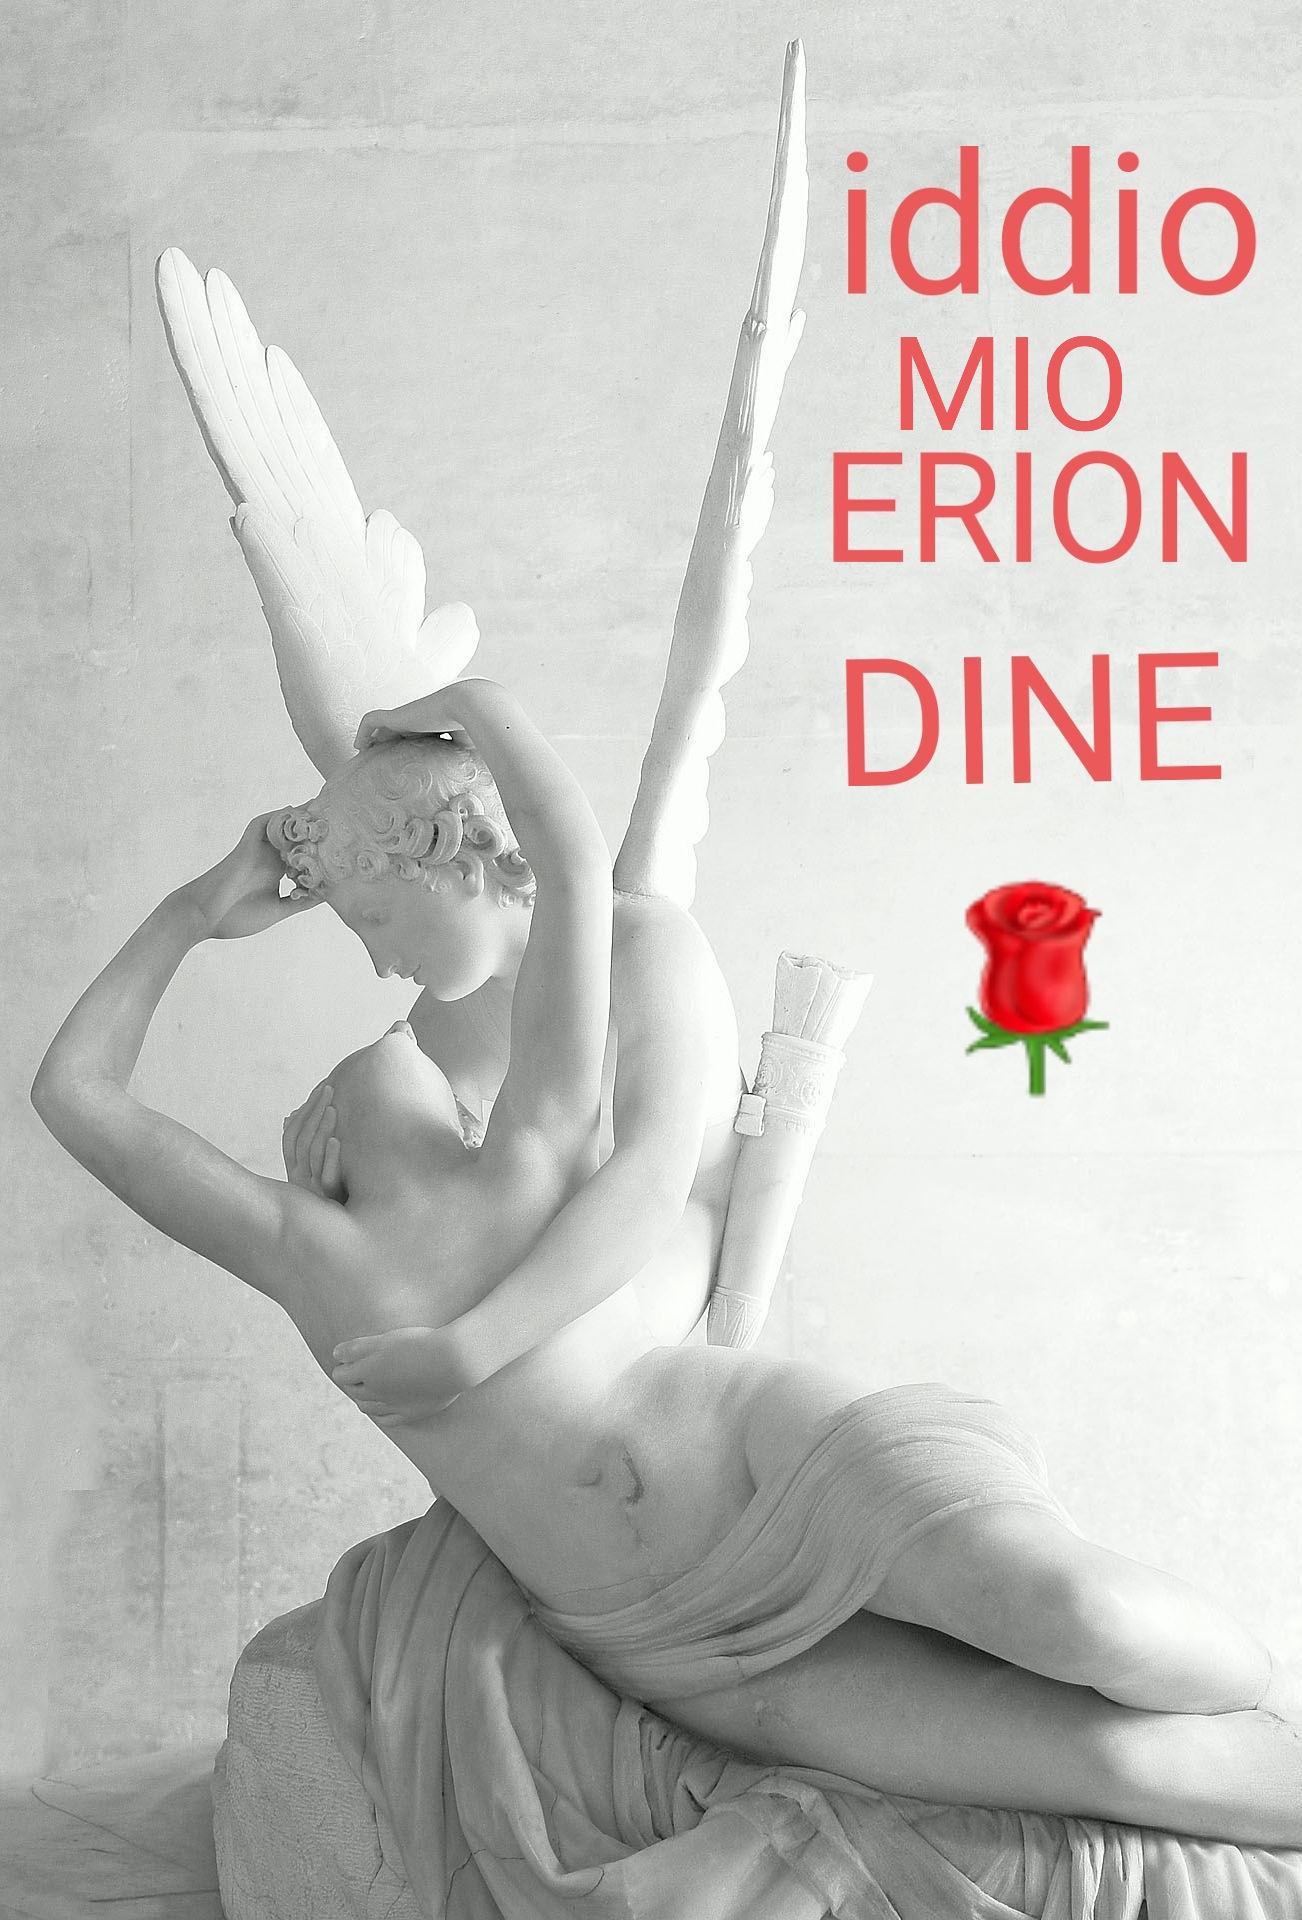 ERION DINE HYQMETI